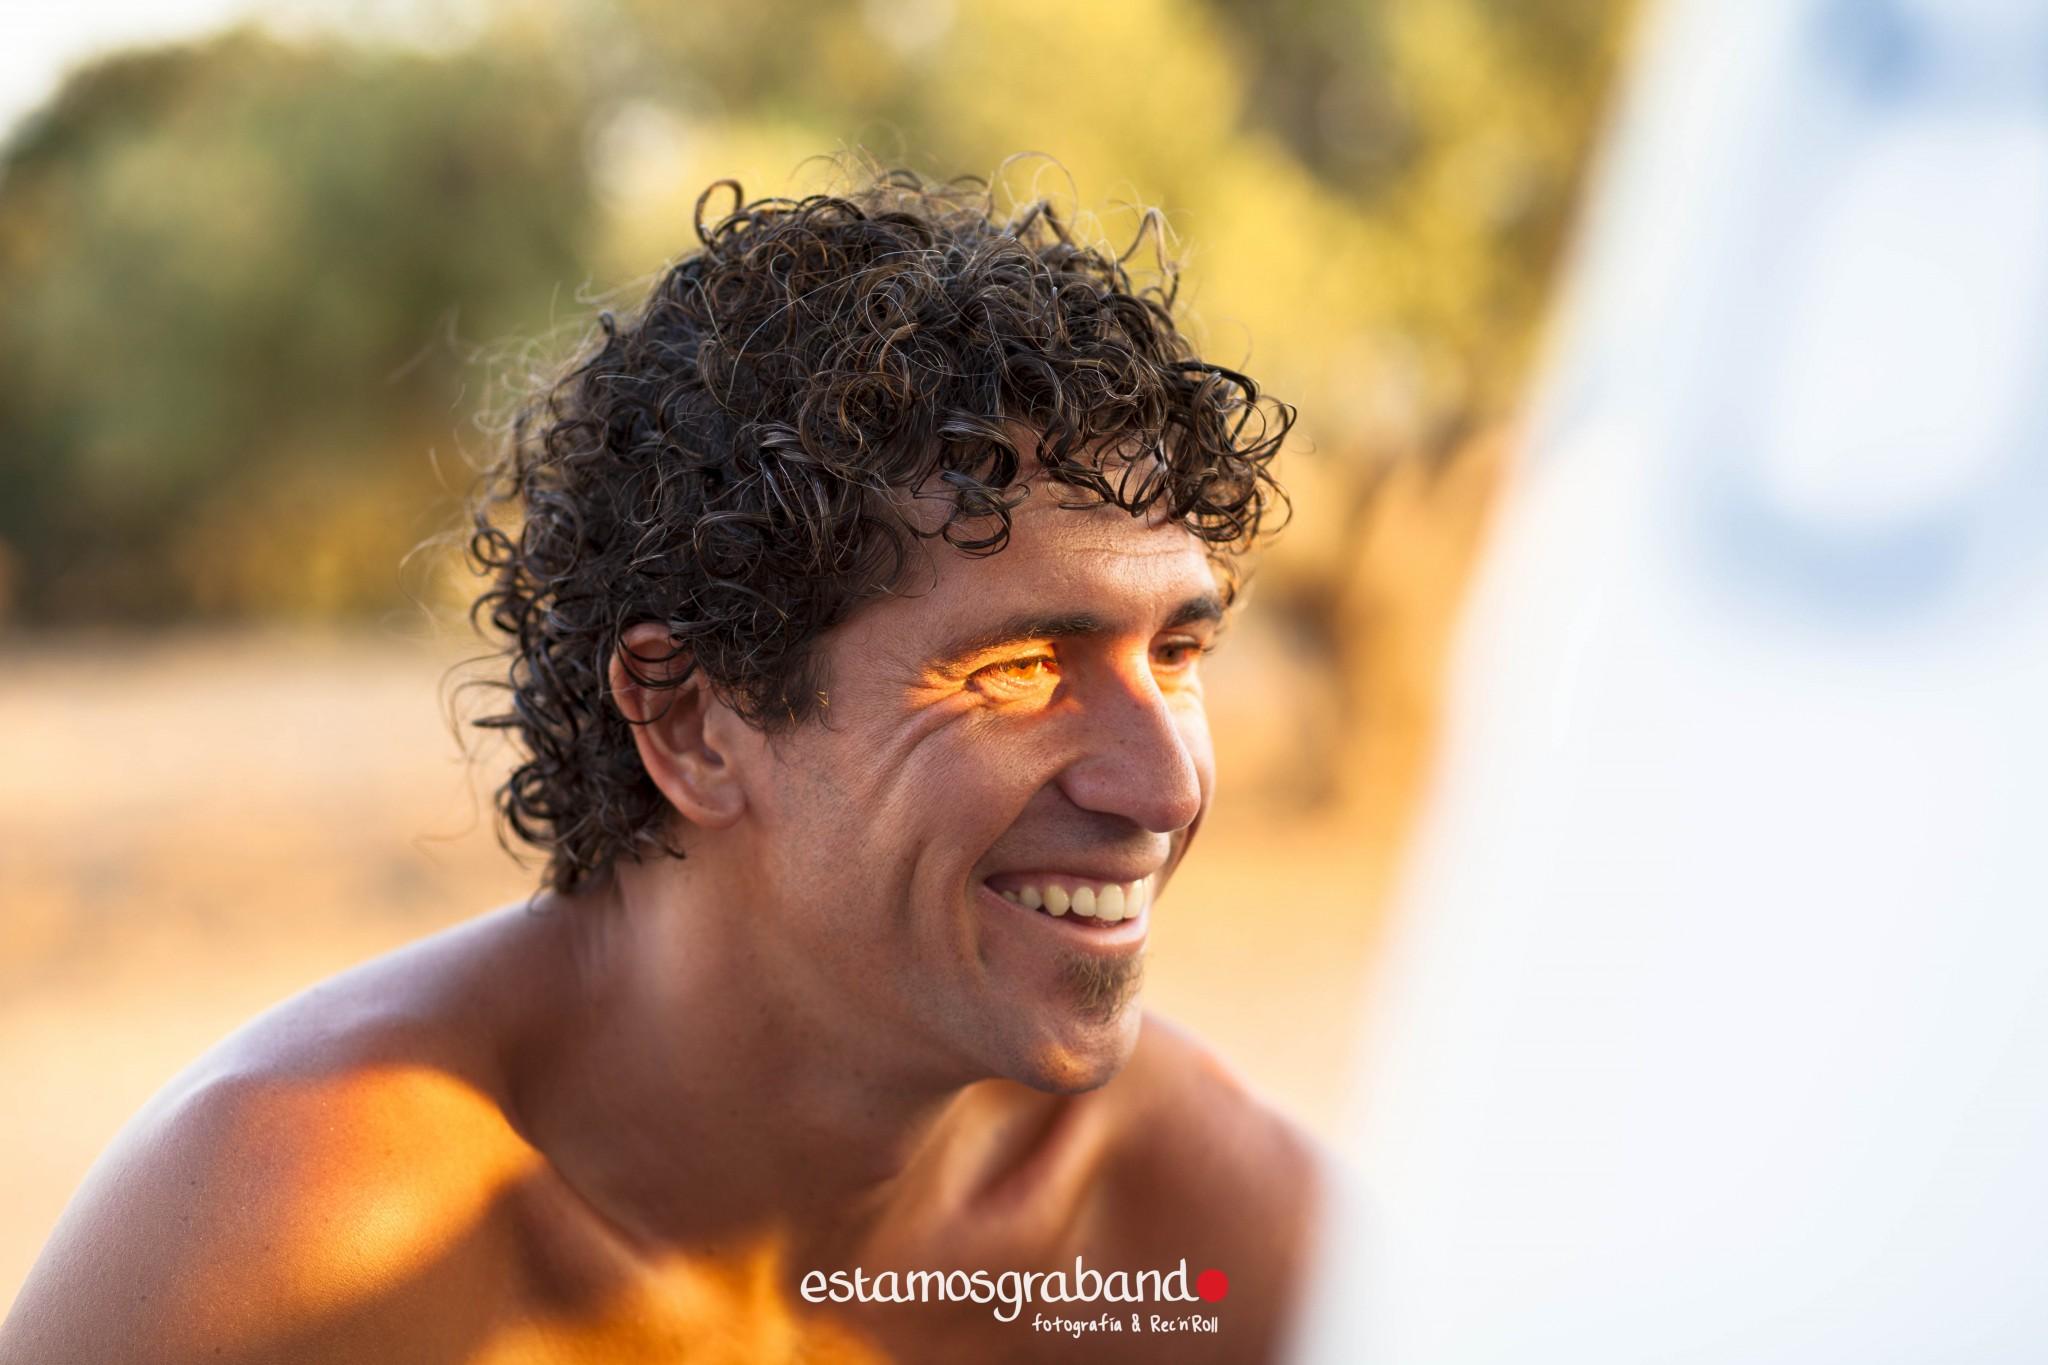 miriam-y-jesucc81s_preboda-blog-15 Surf & Love [Preboda Recandrolera_Miriam & Jesús] - video boda cadiz